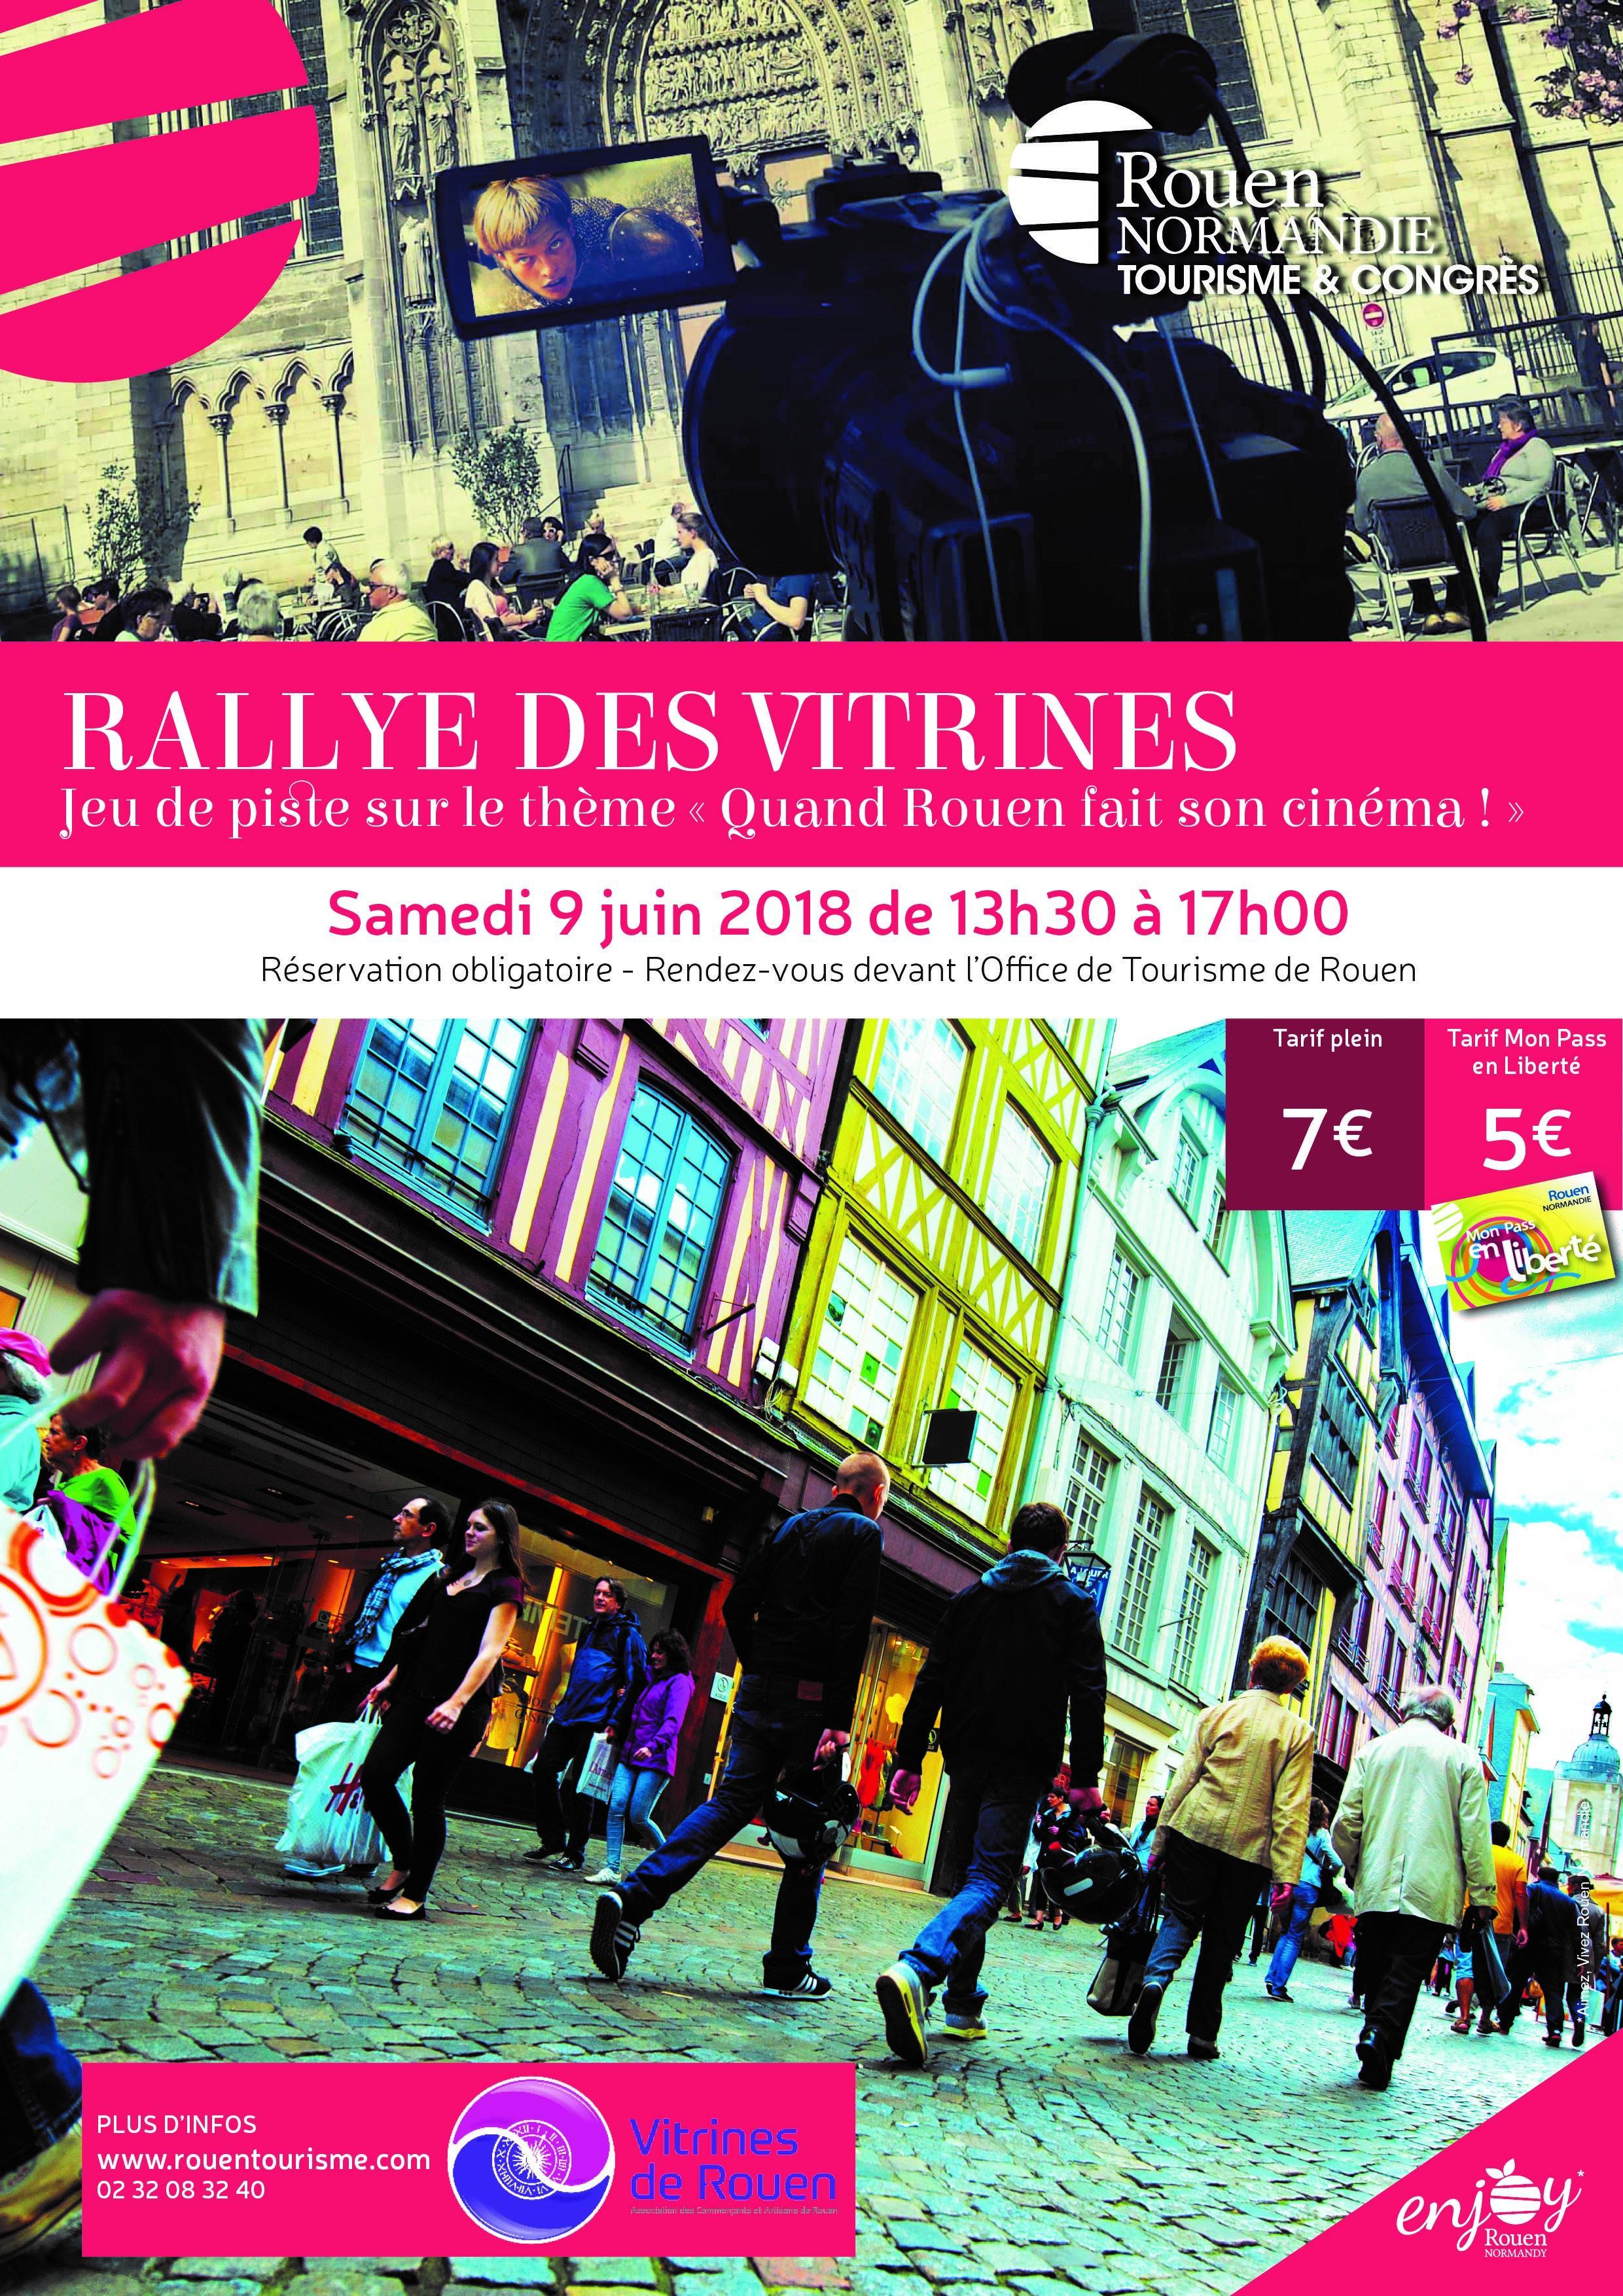 Rallye des vitrines, samedi 09 juin 2018